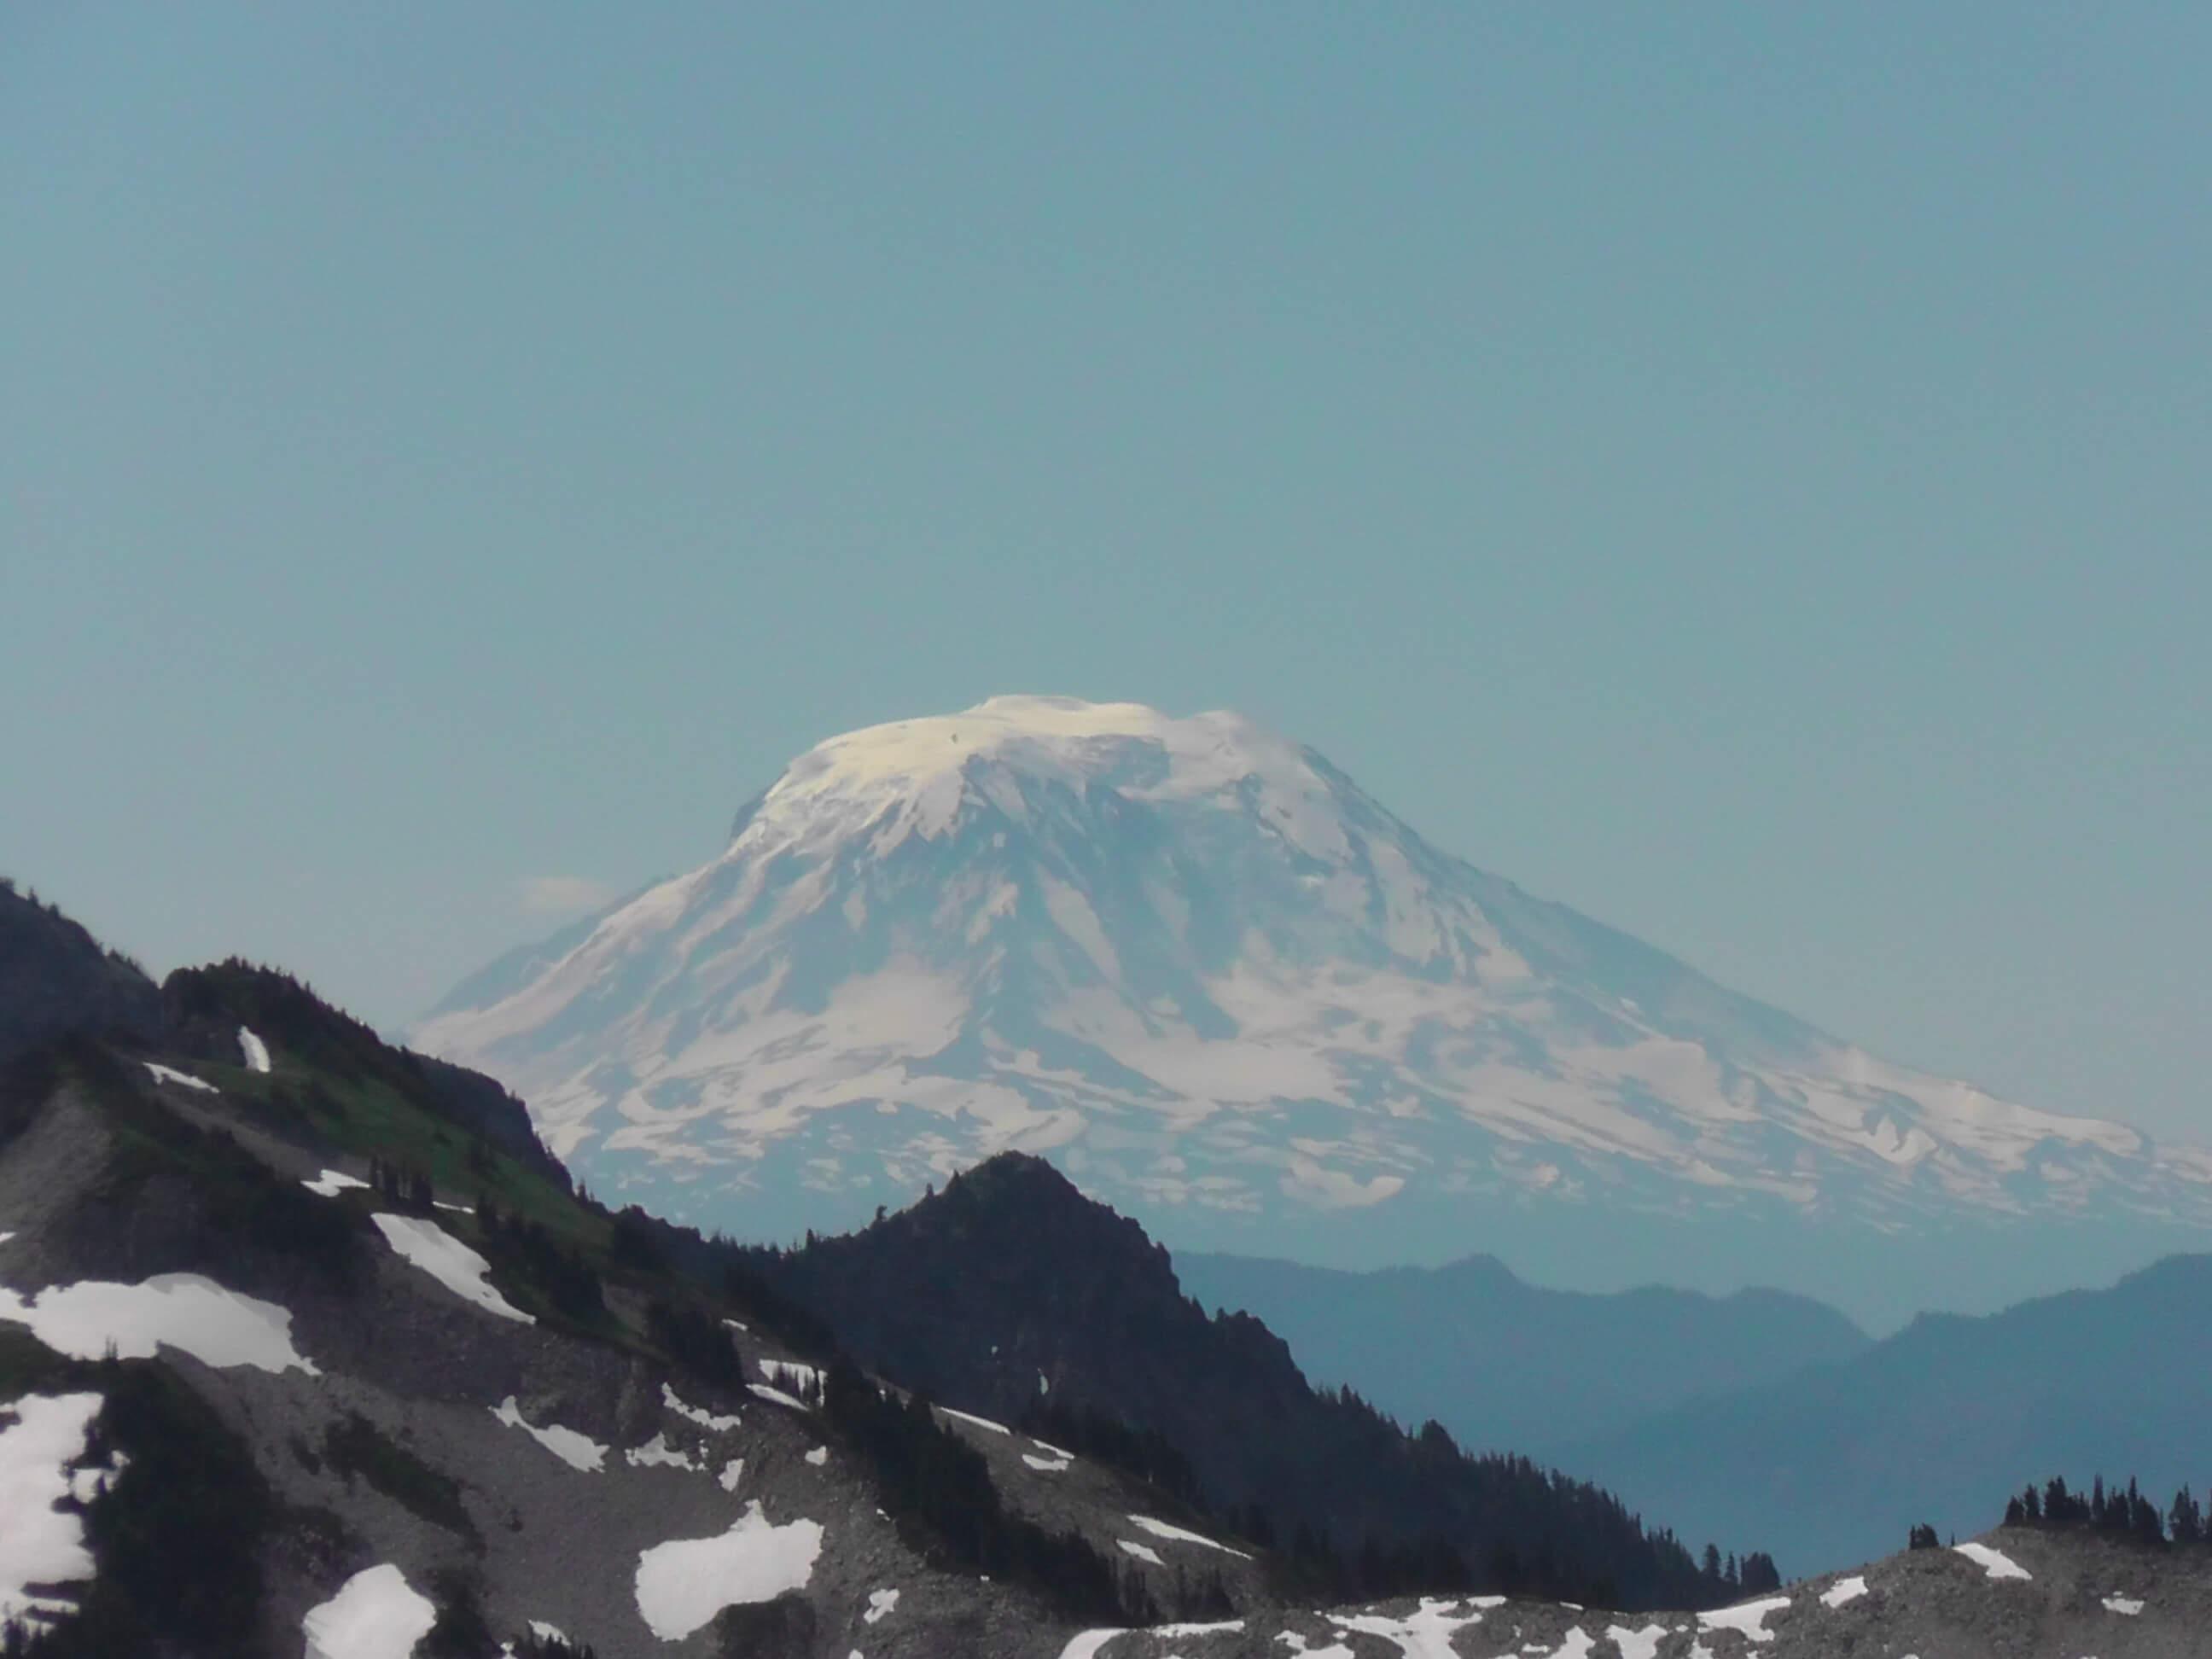 Mount Adams as seen from Mount Rainier National Park